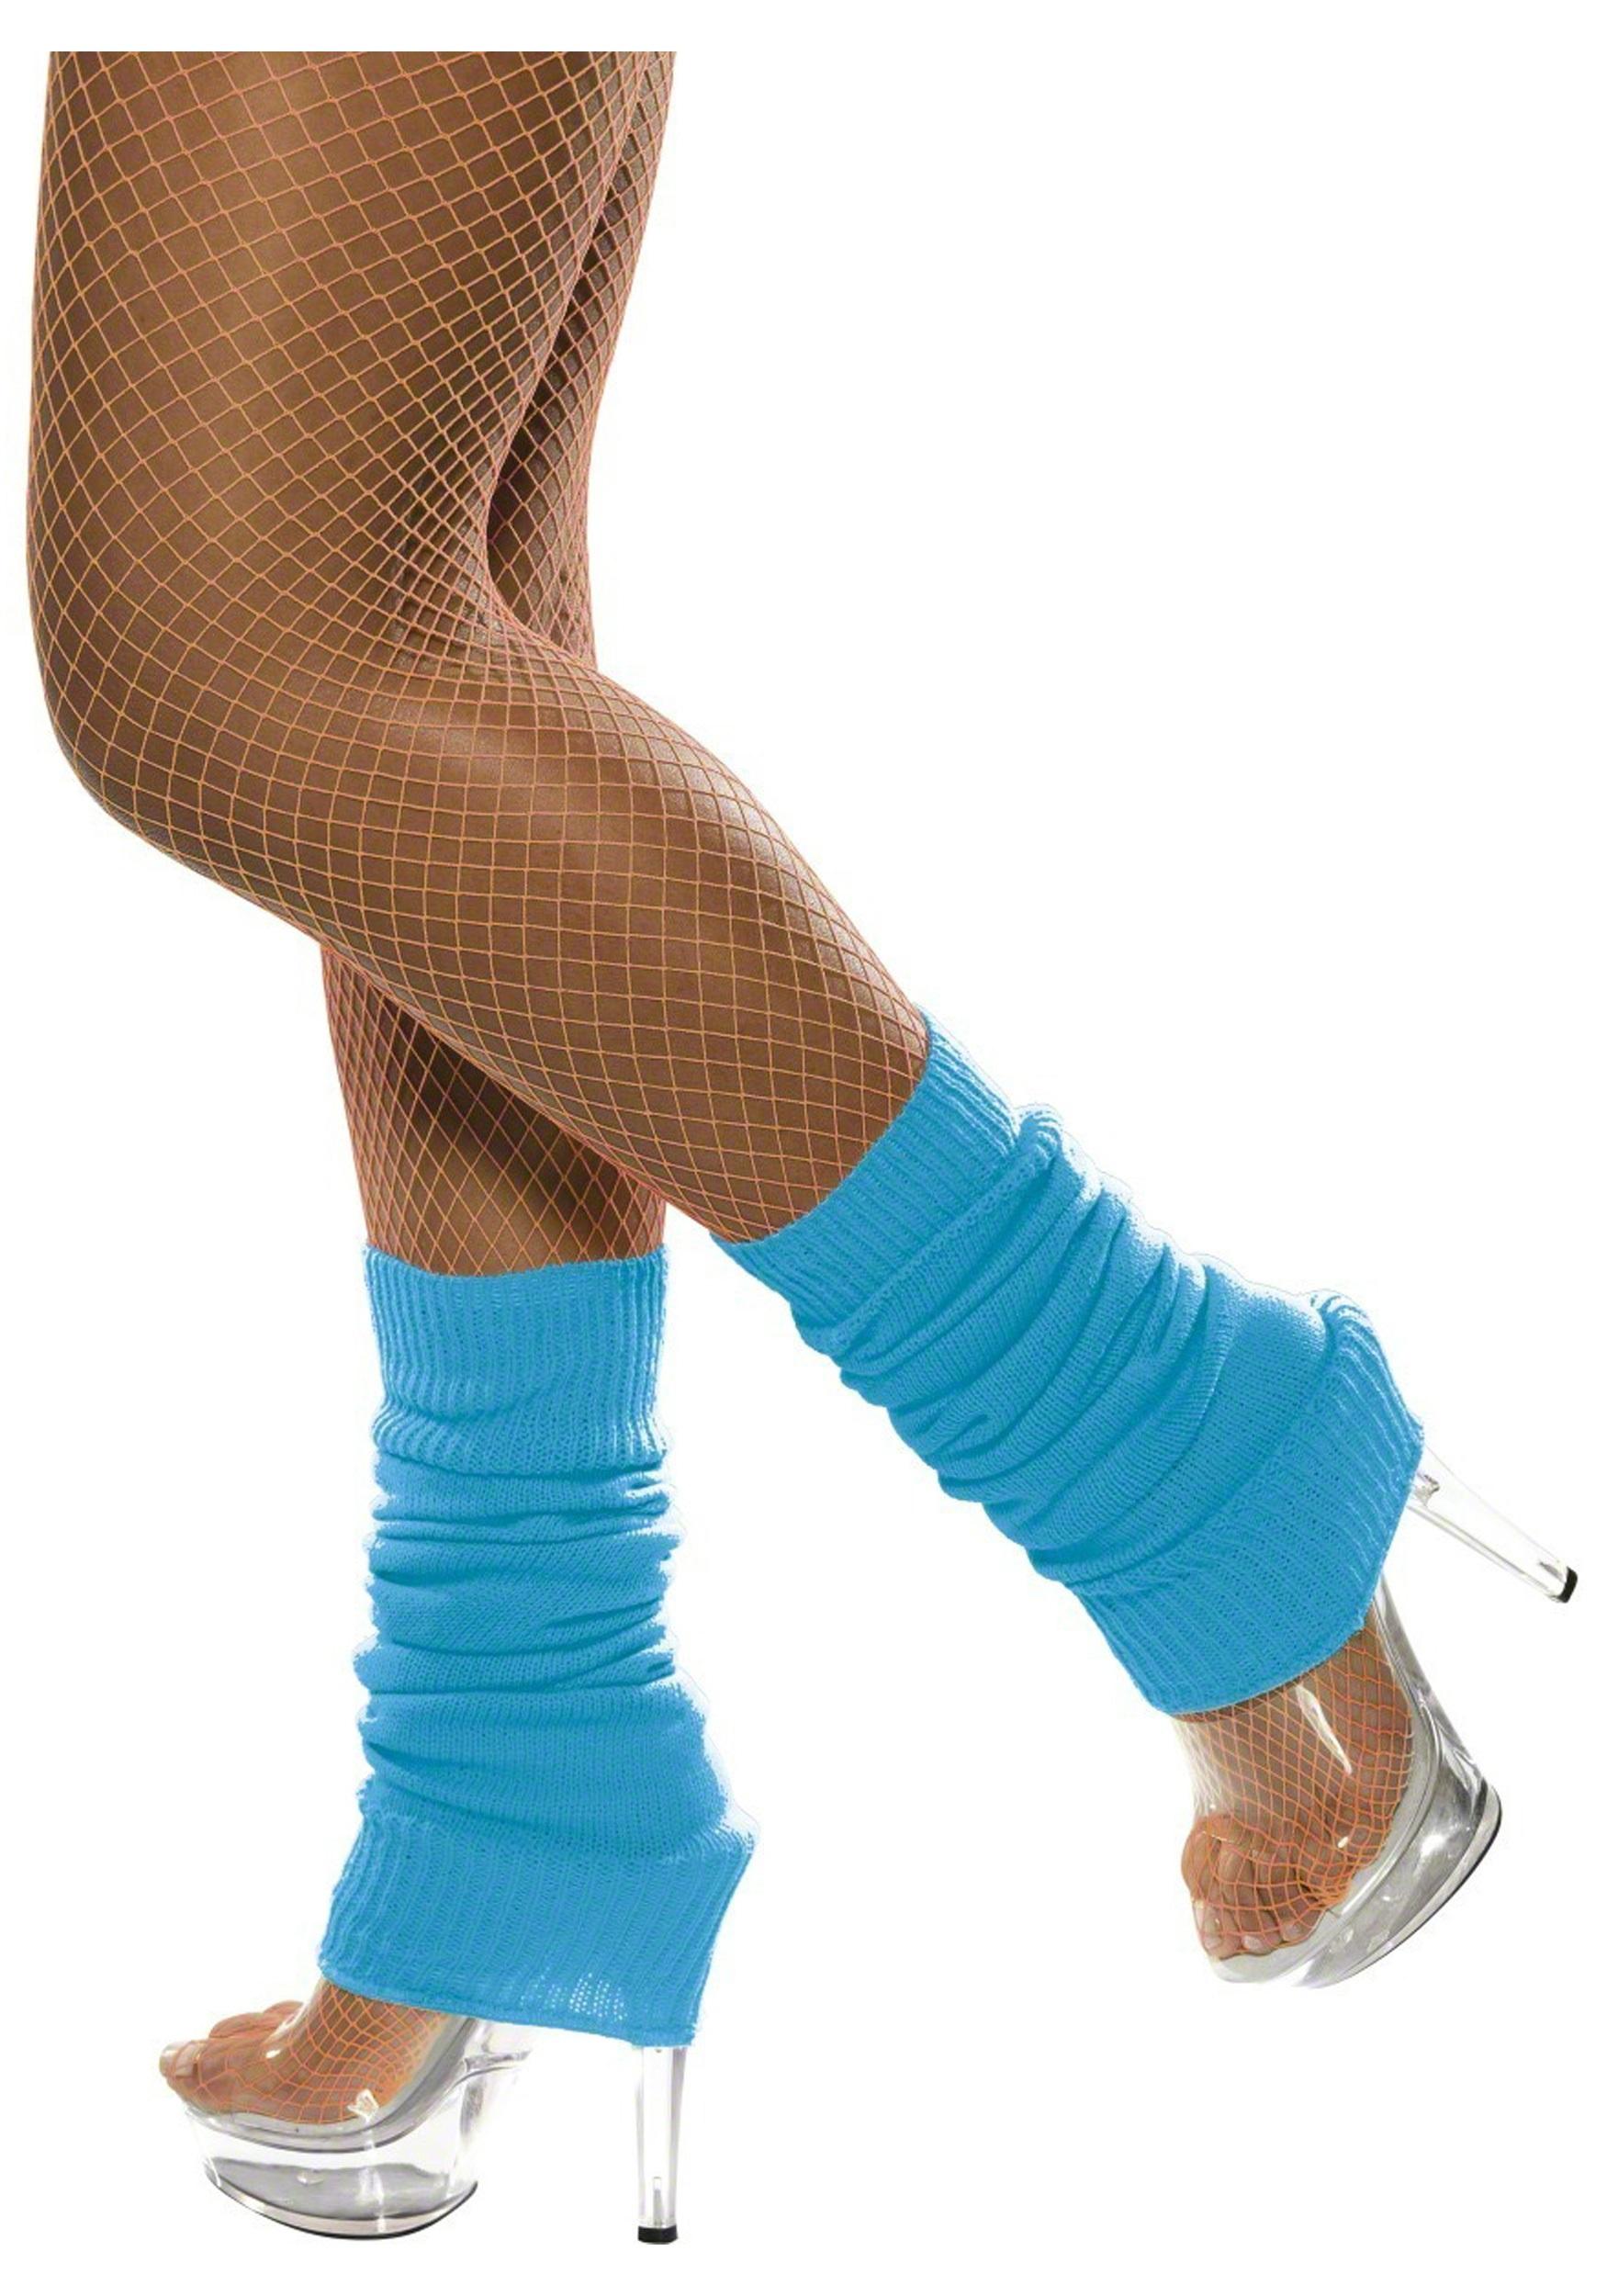 Neon Blue Leg Warmers - 80s Costume Ideas, Halloween Costumes